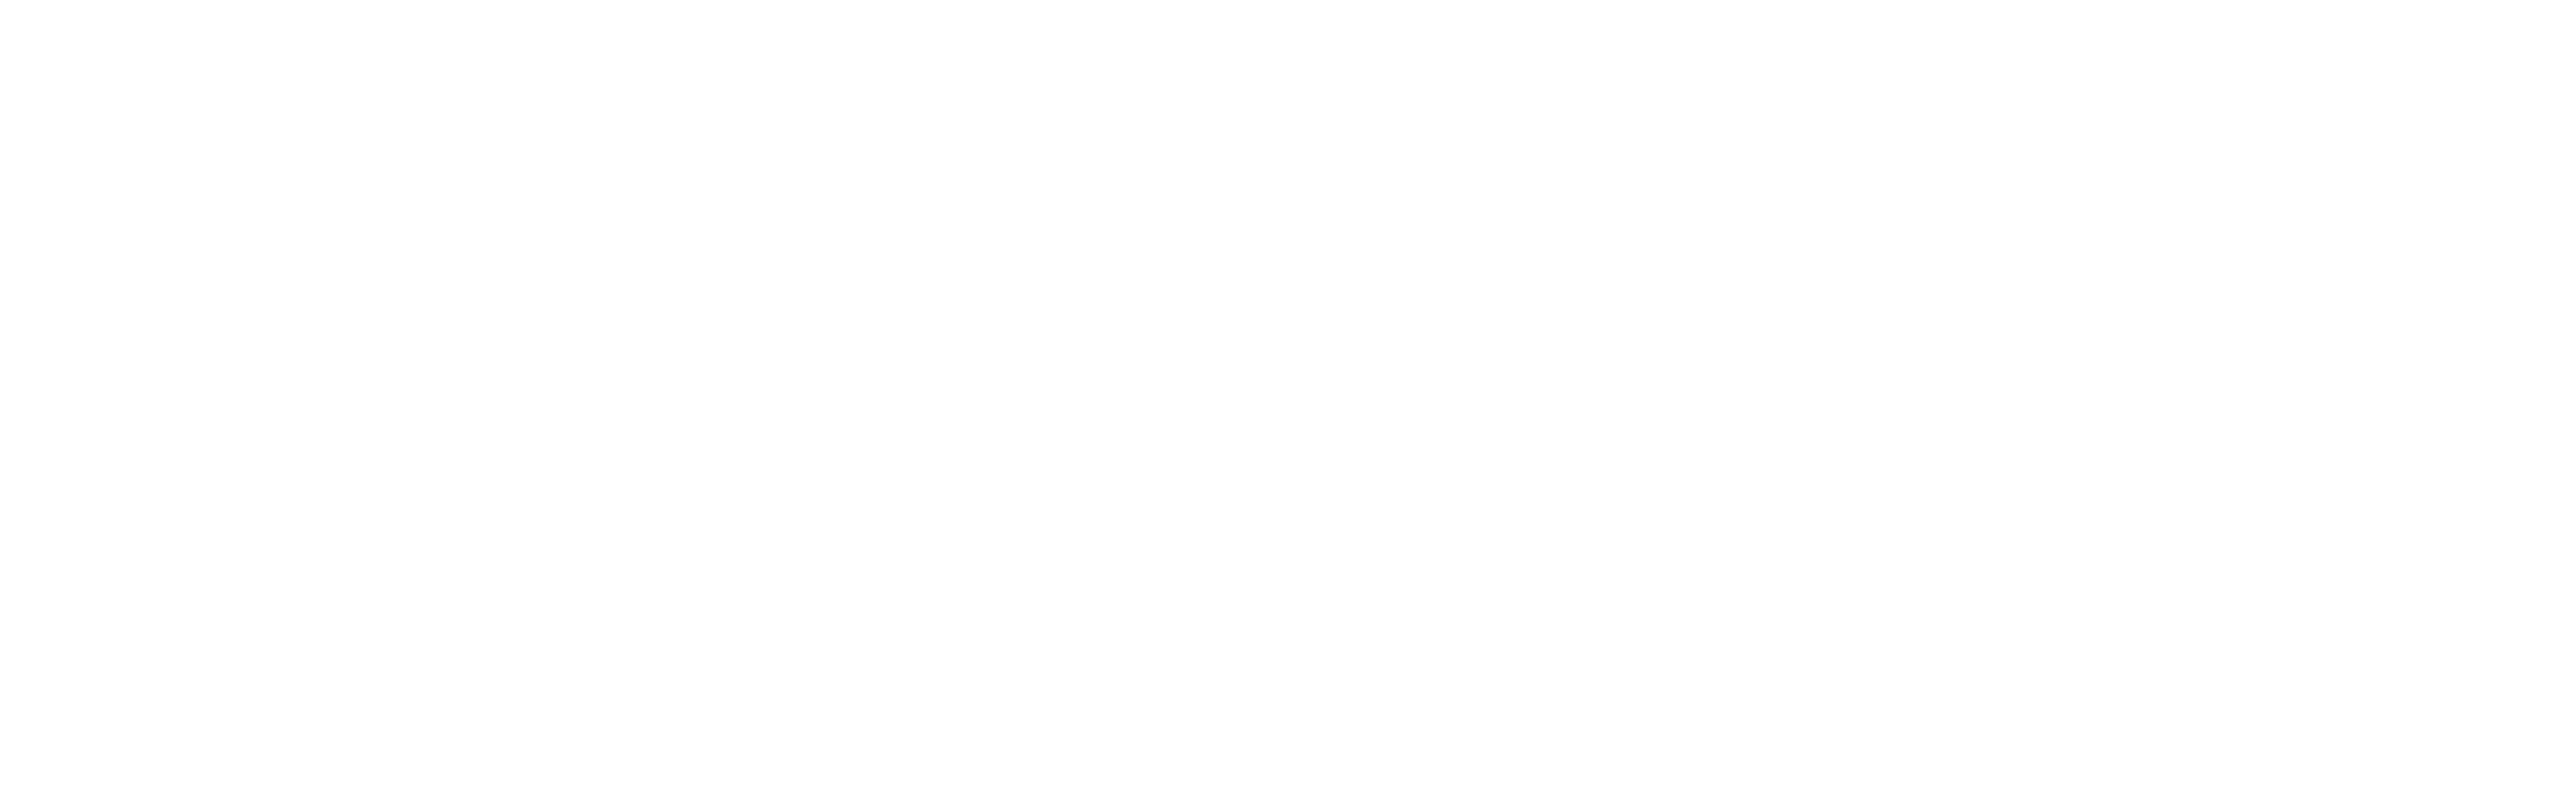 Logo Homy Química horizontal branca alpha